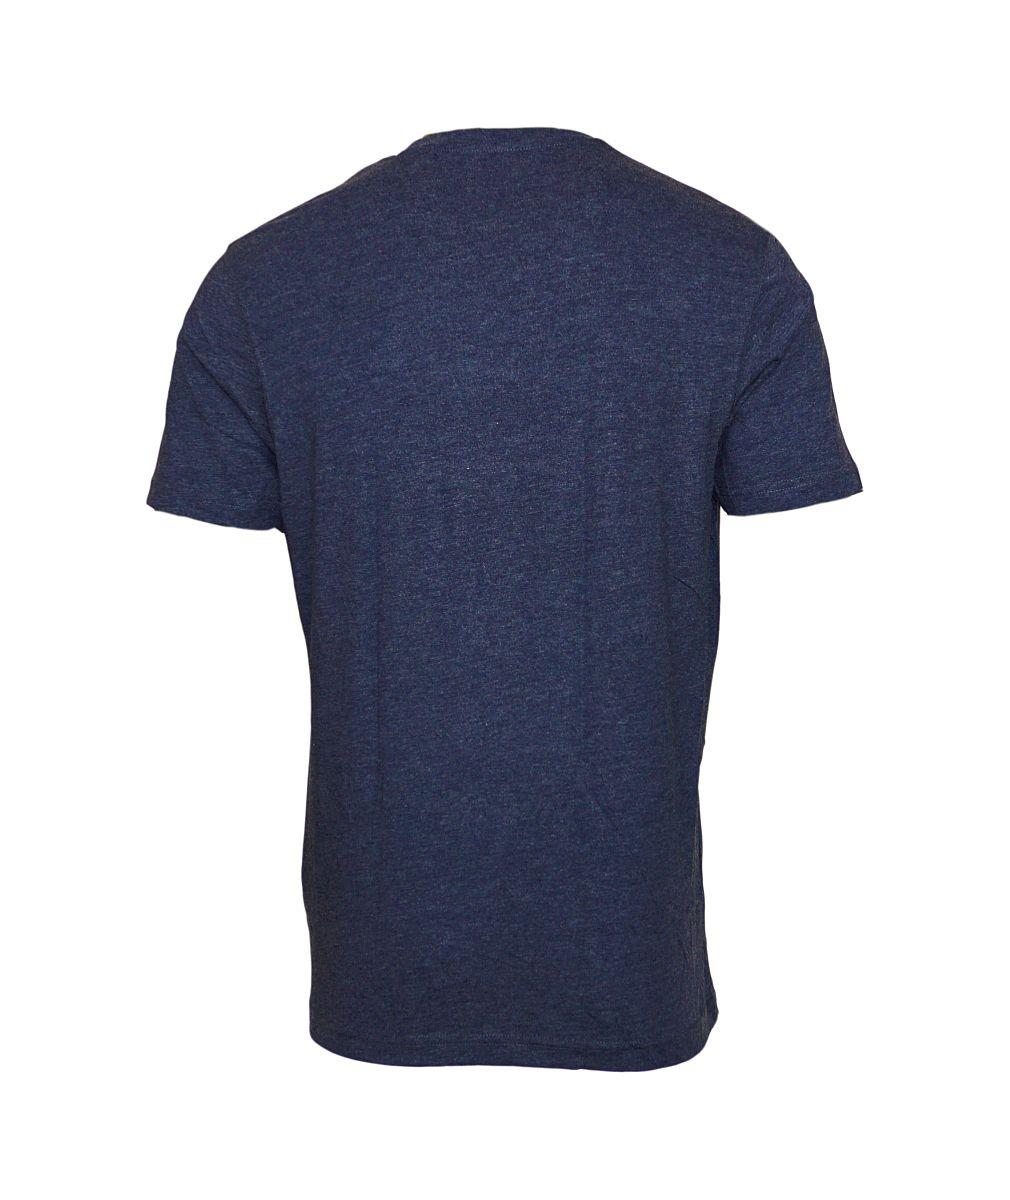 Daniel Hechter 2er Pack T-Shirts Rundhals 76001 172972 680 blau melange SH17-DH2P